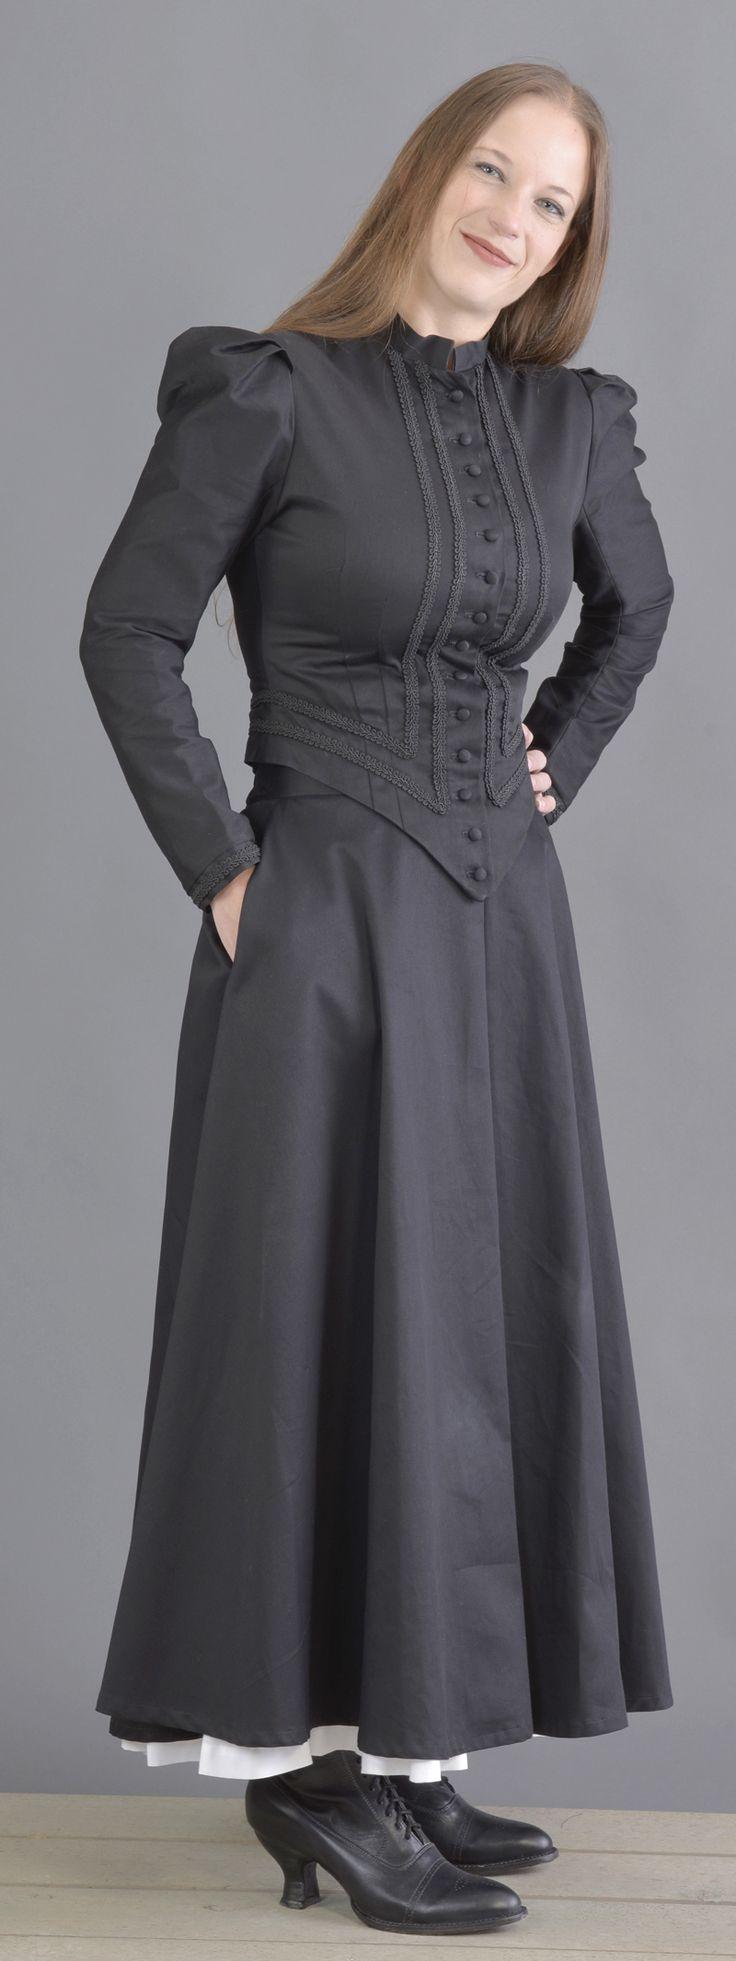 67 Best Women U0026 39 S Old West Clothing Images On Pinterest